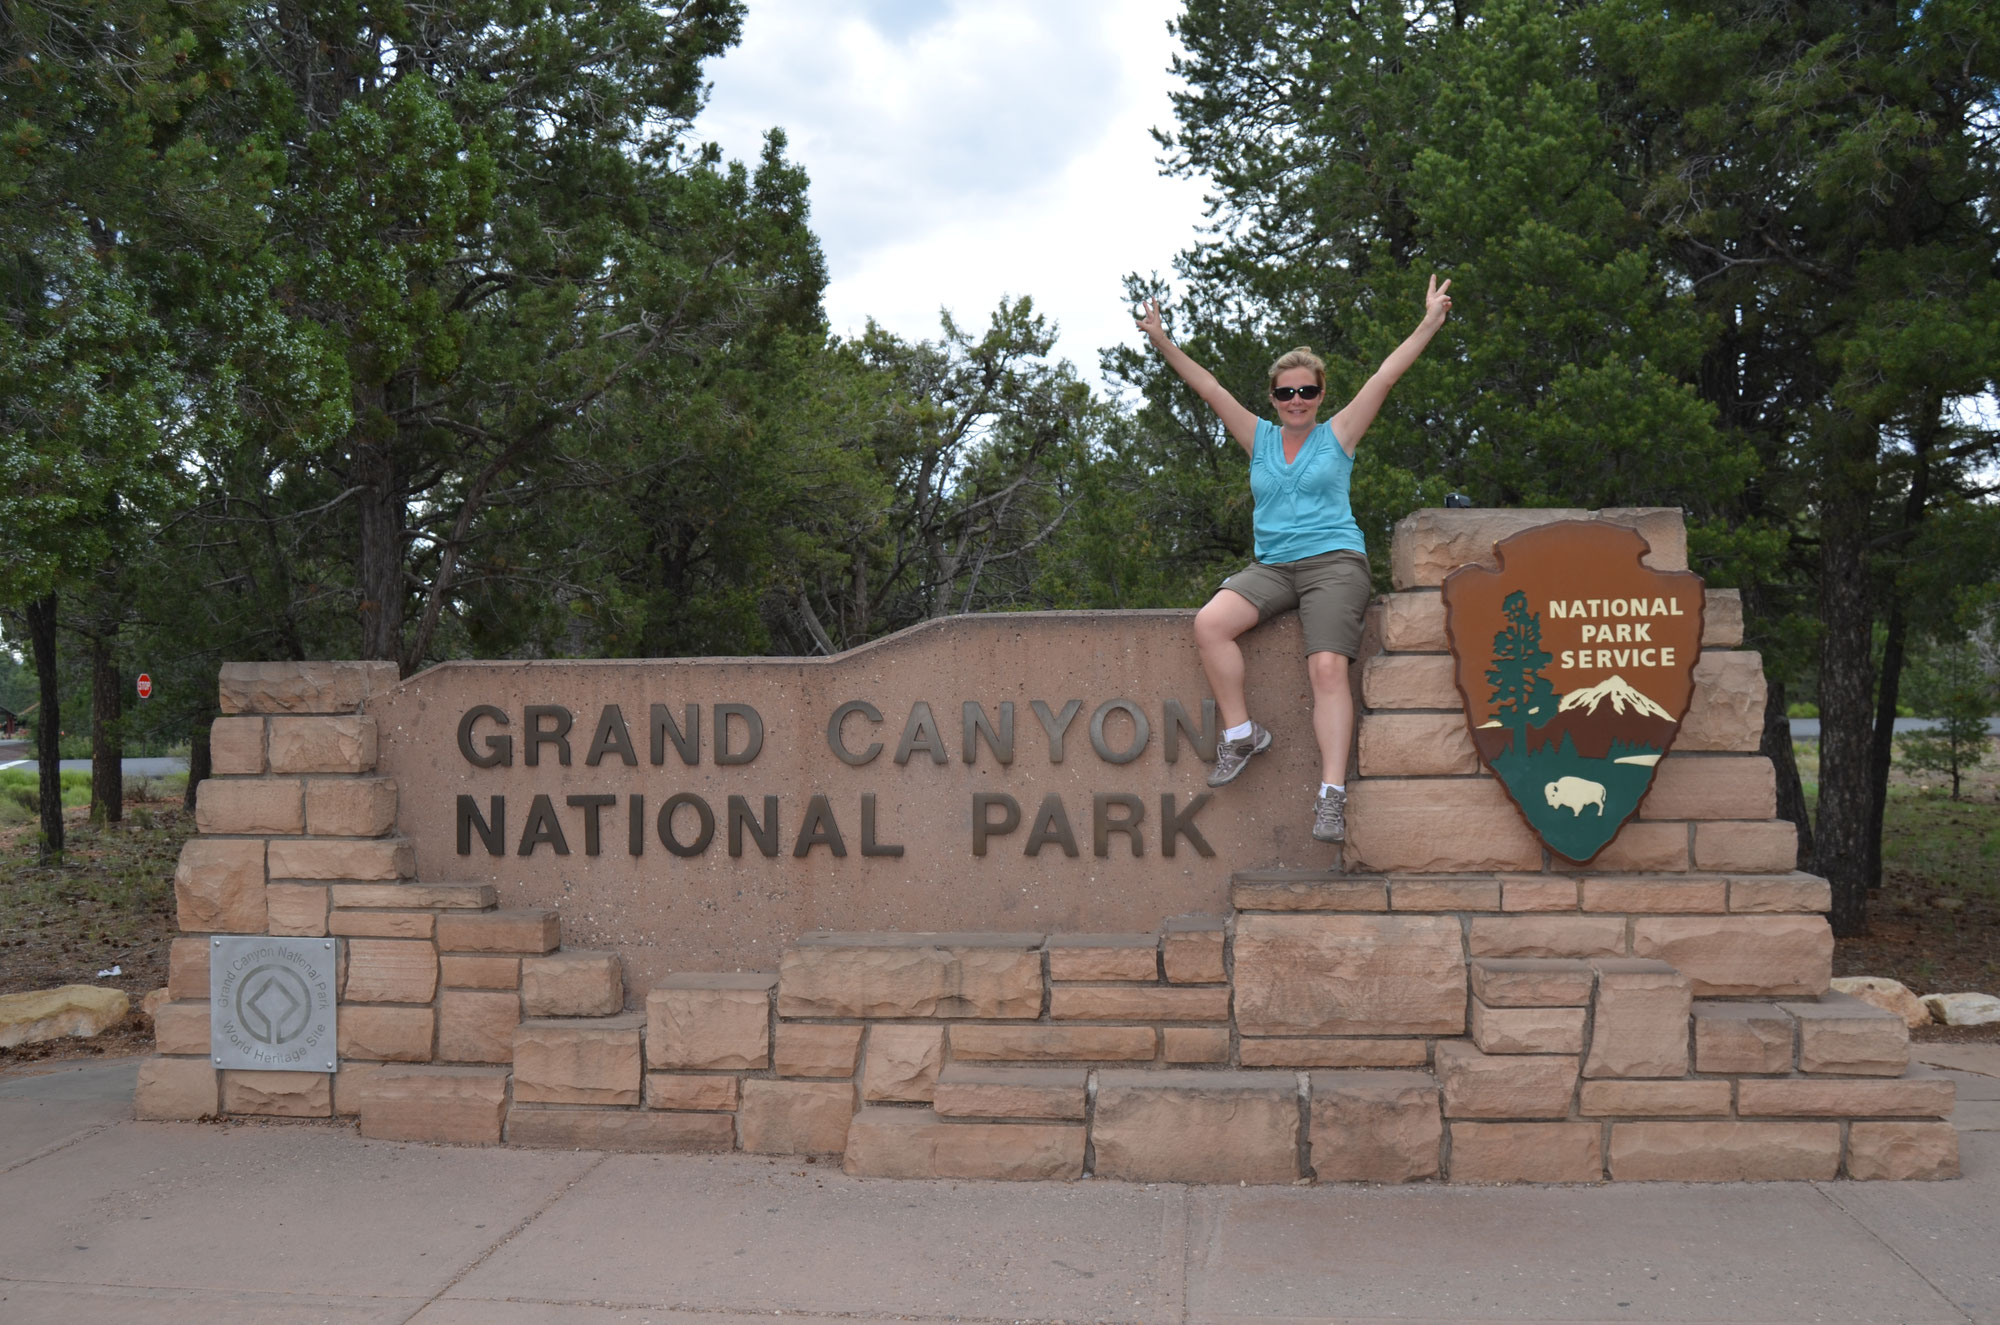 ROAD TRIP USA - Grand Canyon National Park